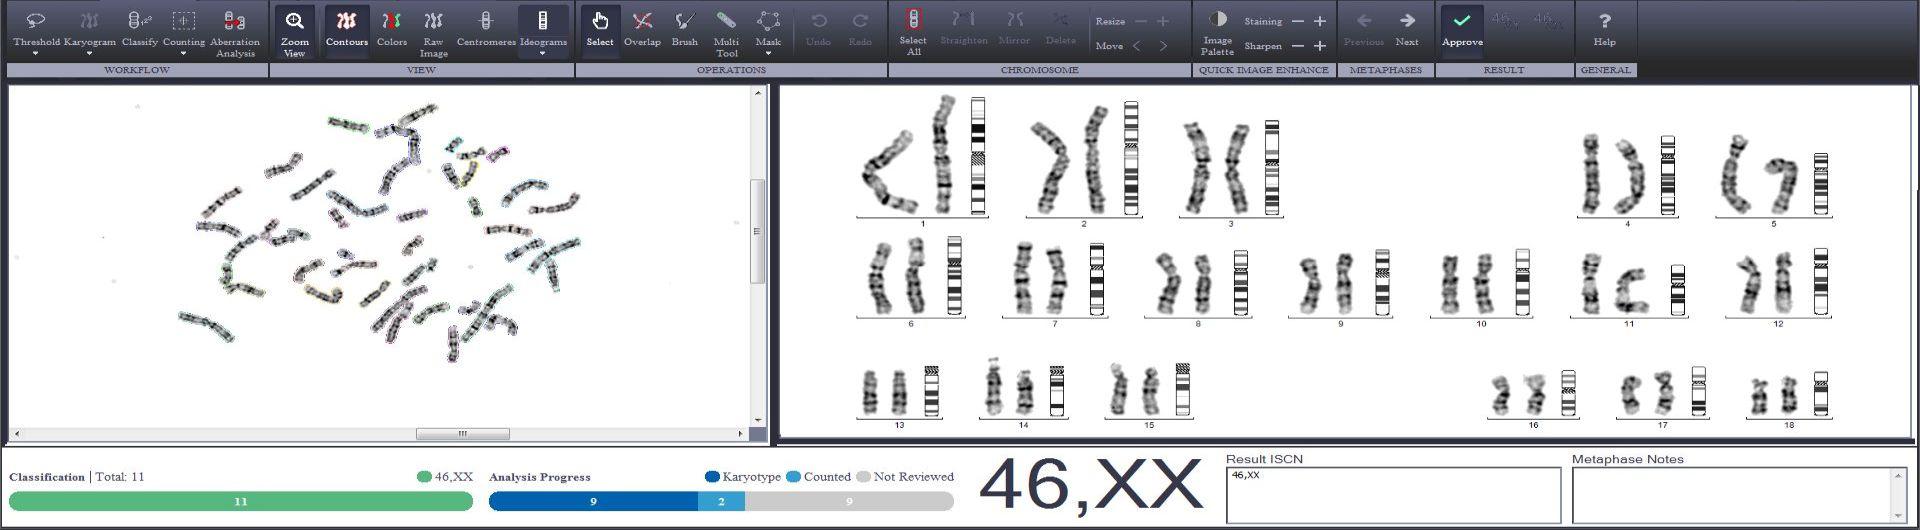 karyotype-main2